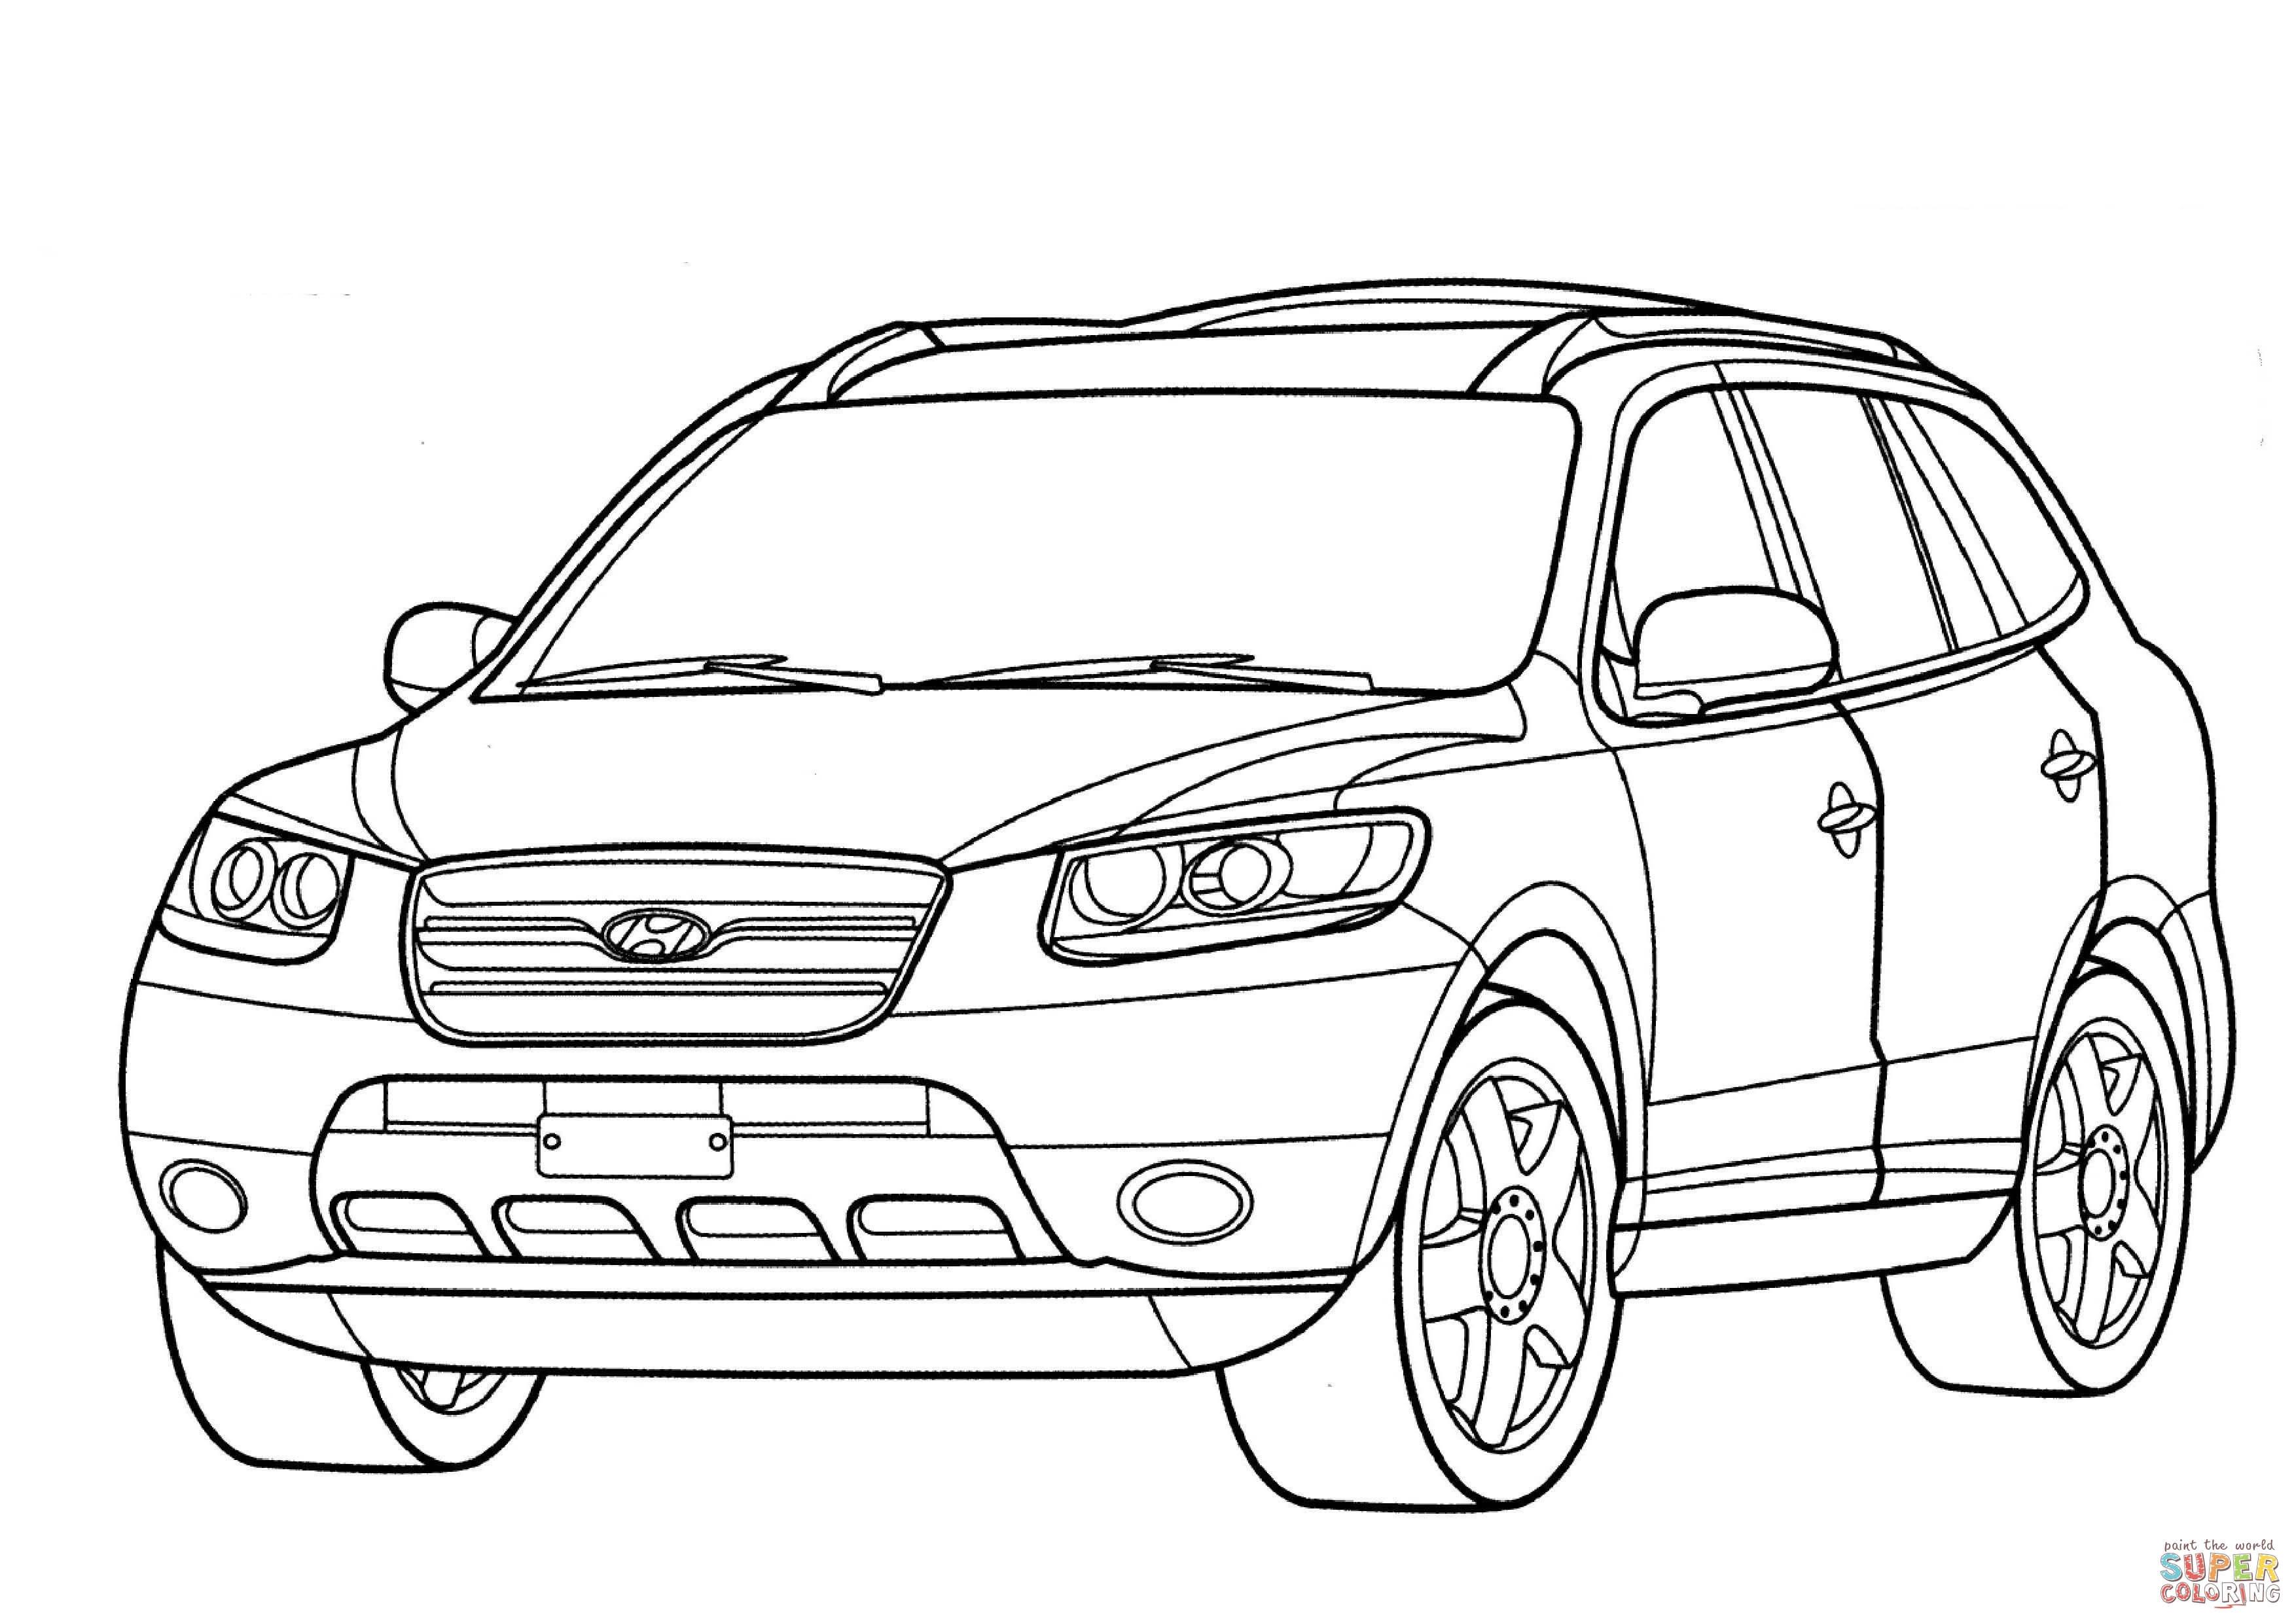 Dibujo De Hyundai Santa Fe Para Colorear